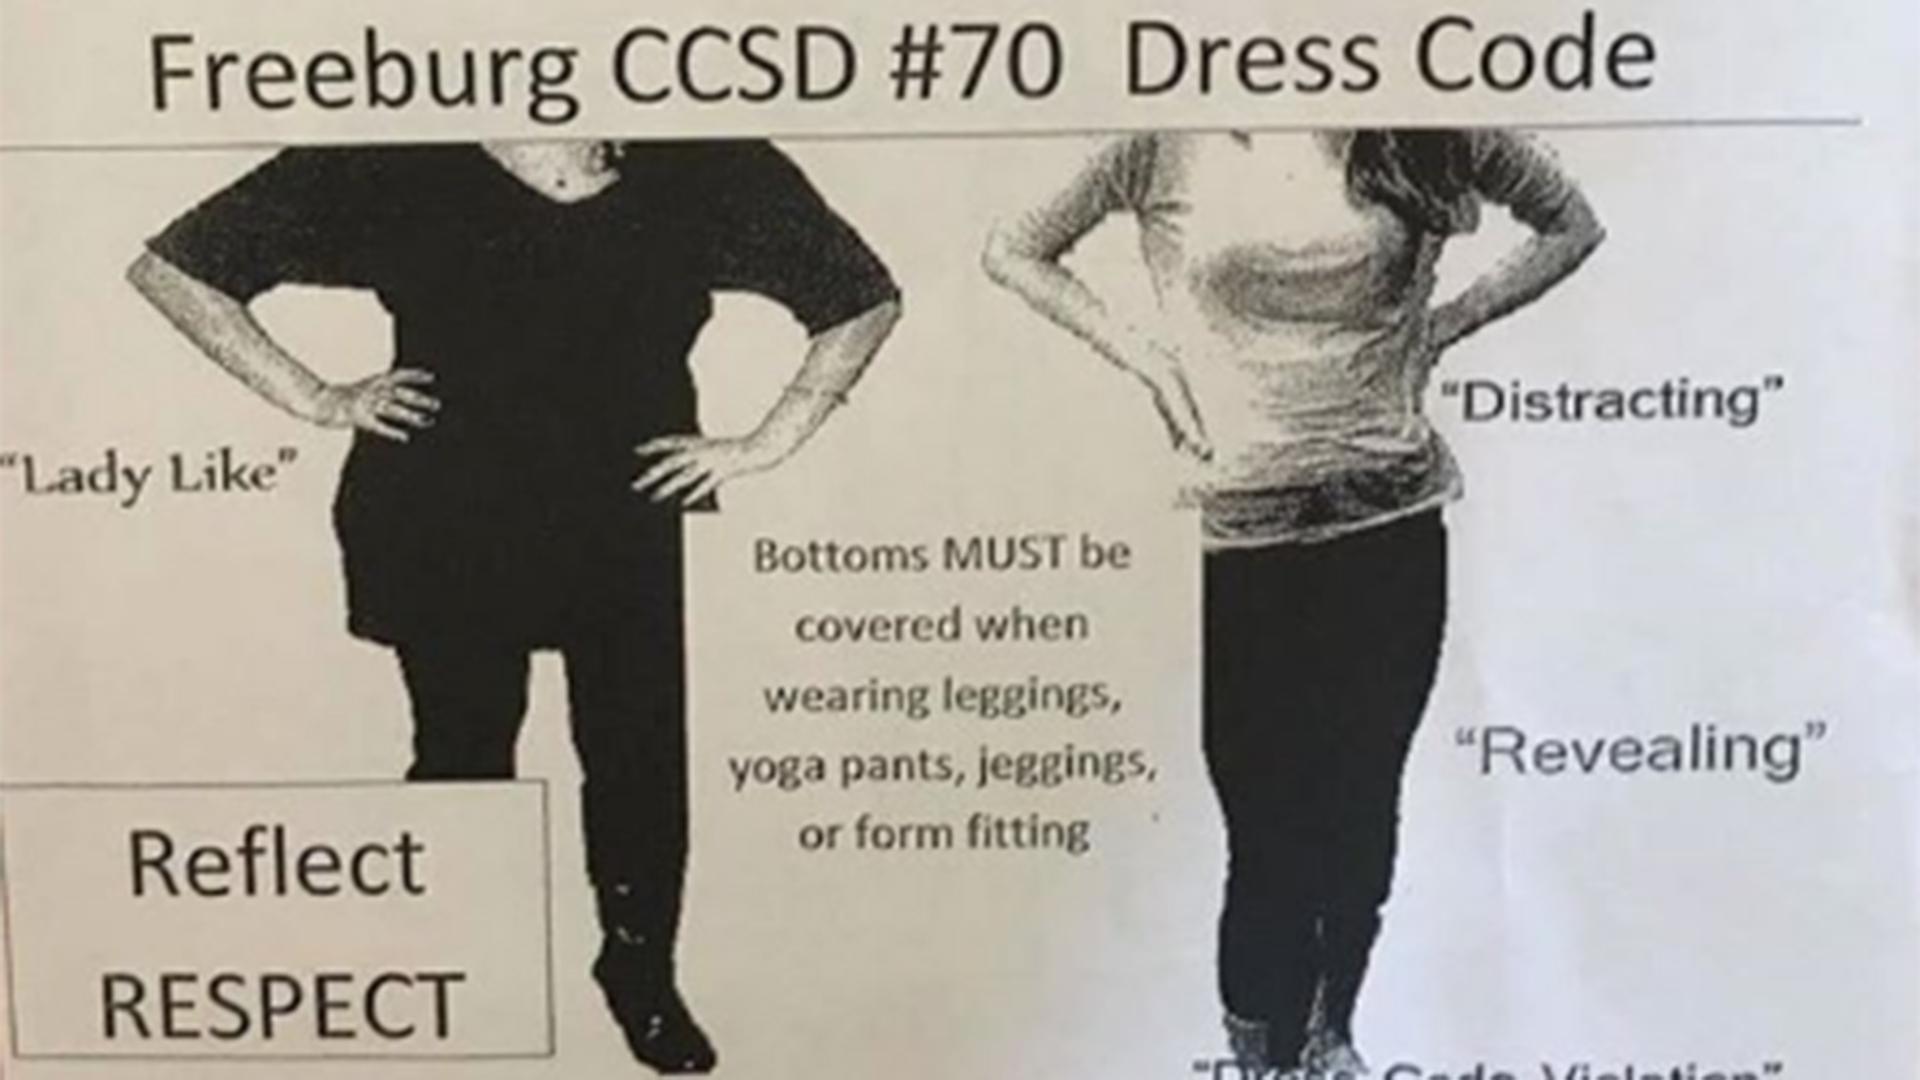 014 Satire Essay On School Dress Code Dresscode Today Tease 27227fd8ea9de65ba33f62eb08a826f4 Beautiful Full